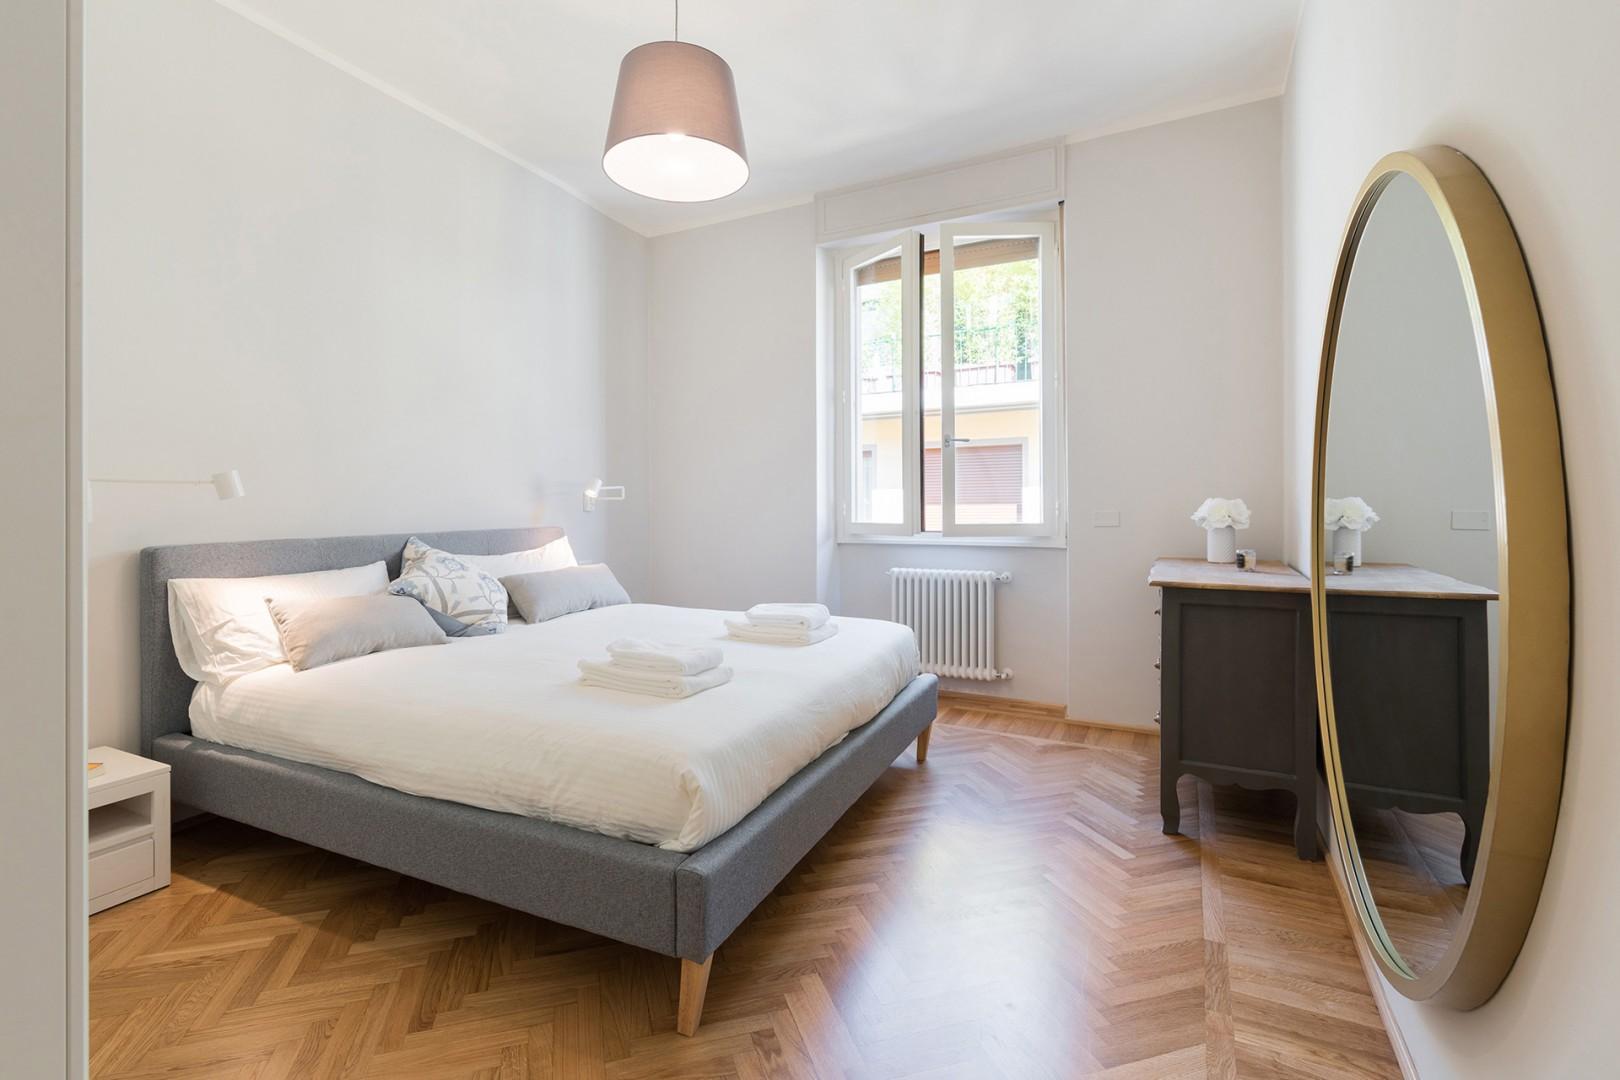 Bedroom 1 with comfortable bed and en suite bathroom.